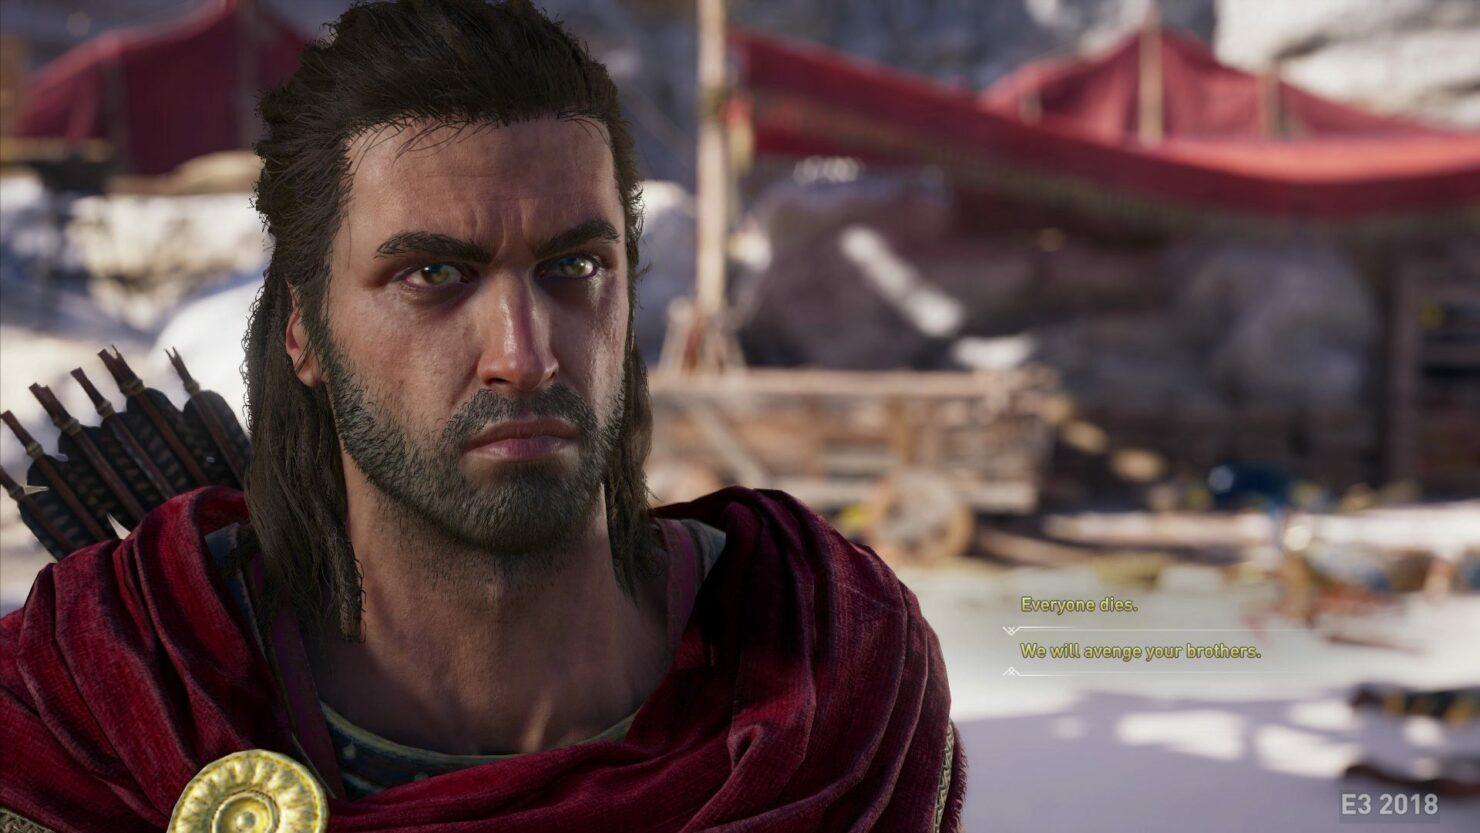 assassins-creed-odyssey-screenshot-leak-screenshot-8